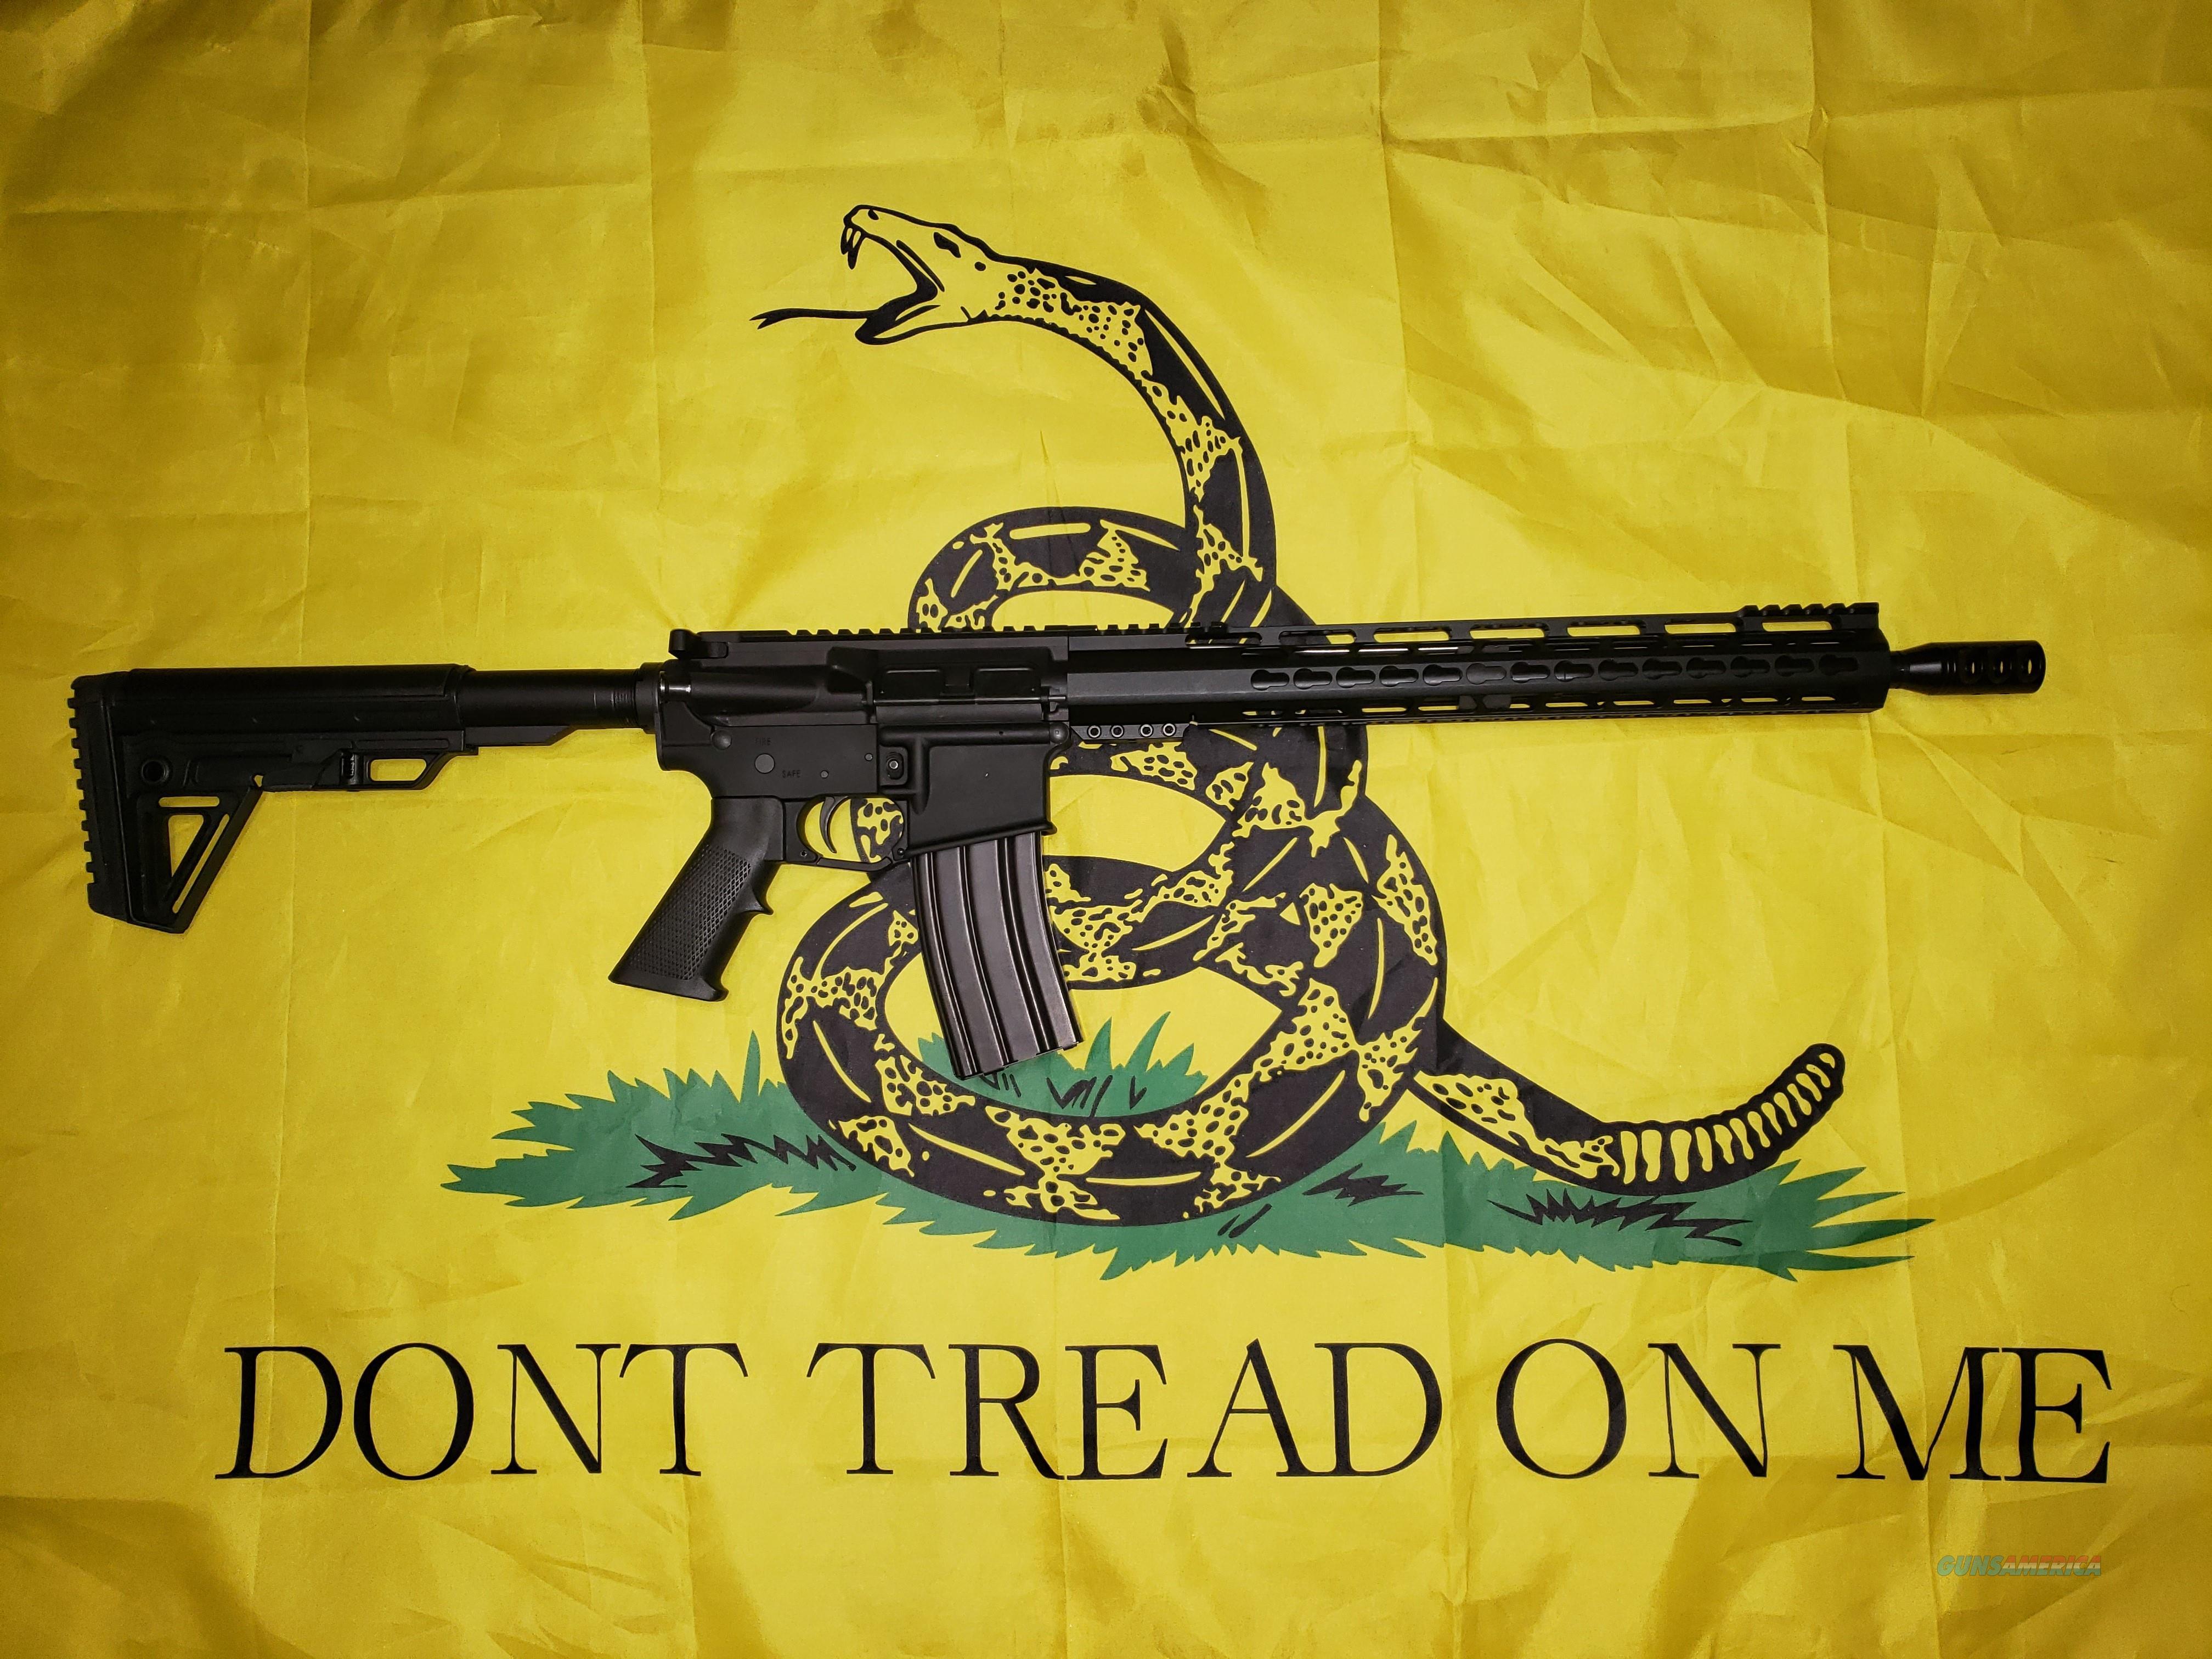 AR-15 5.56 Semi Auto Rifle  Guns > Rifles > AR-15 Rifles - Small Manufacturers > Complete Rifle